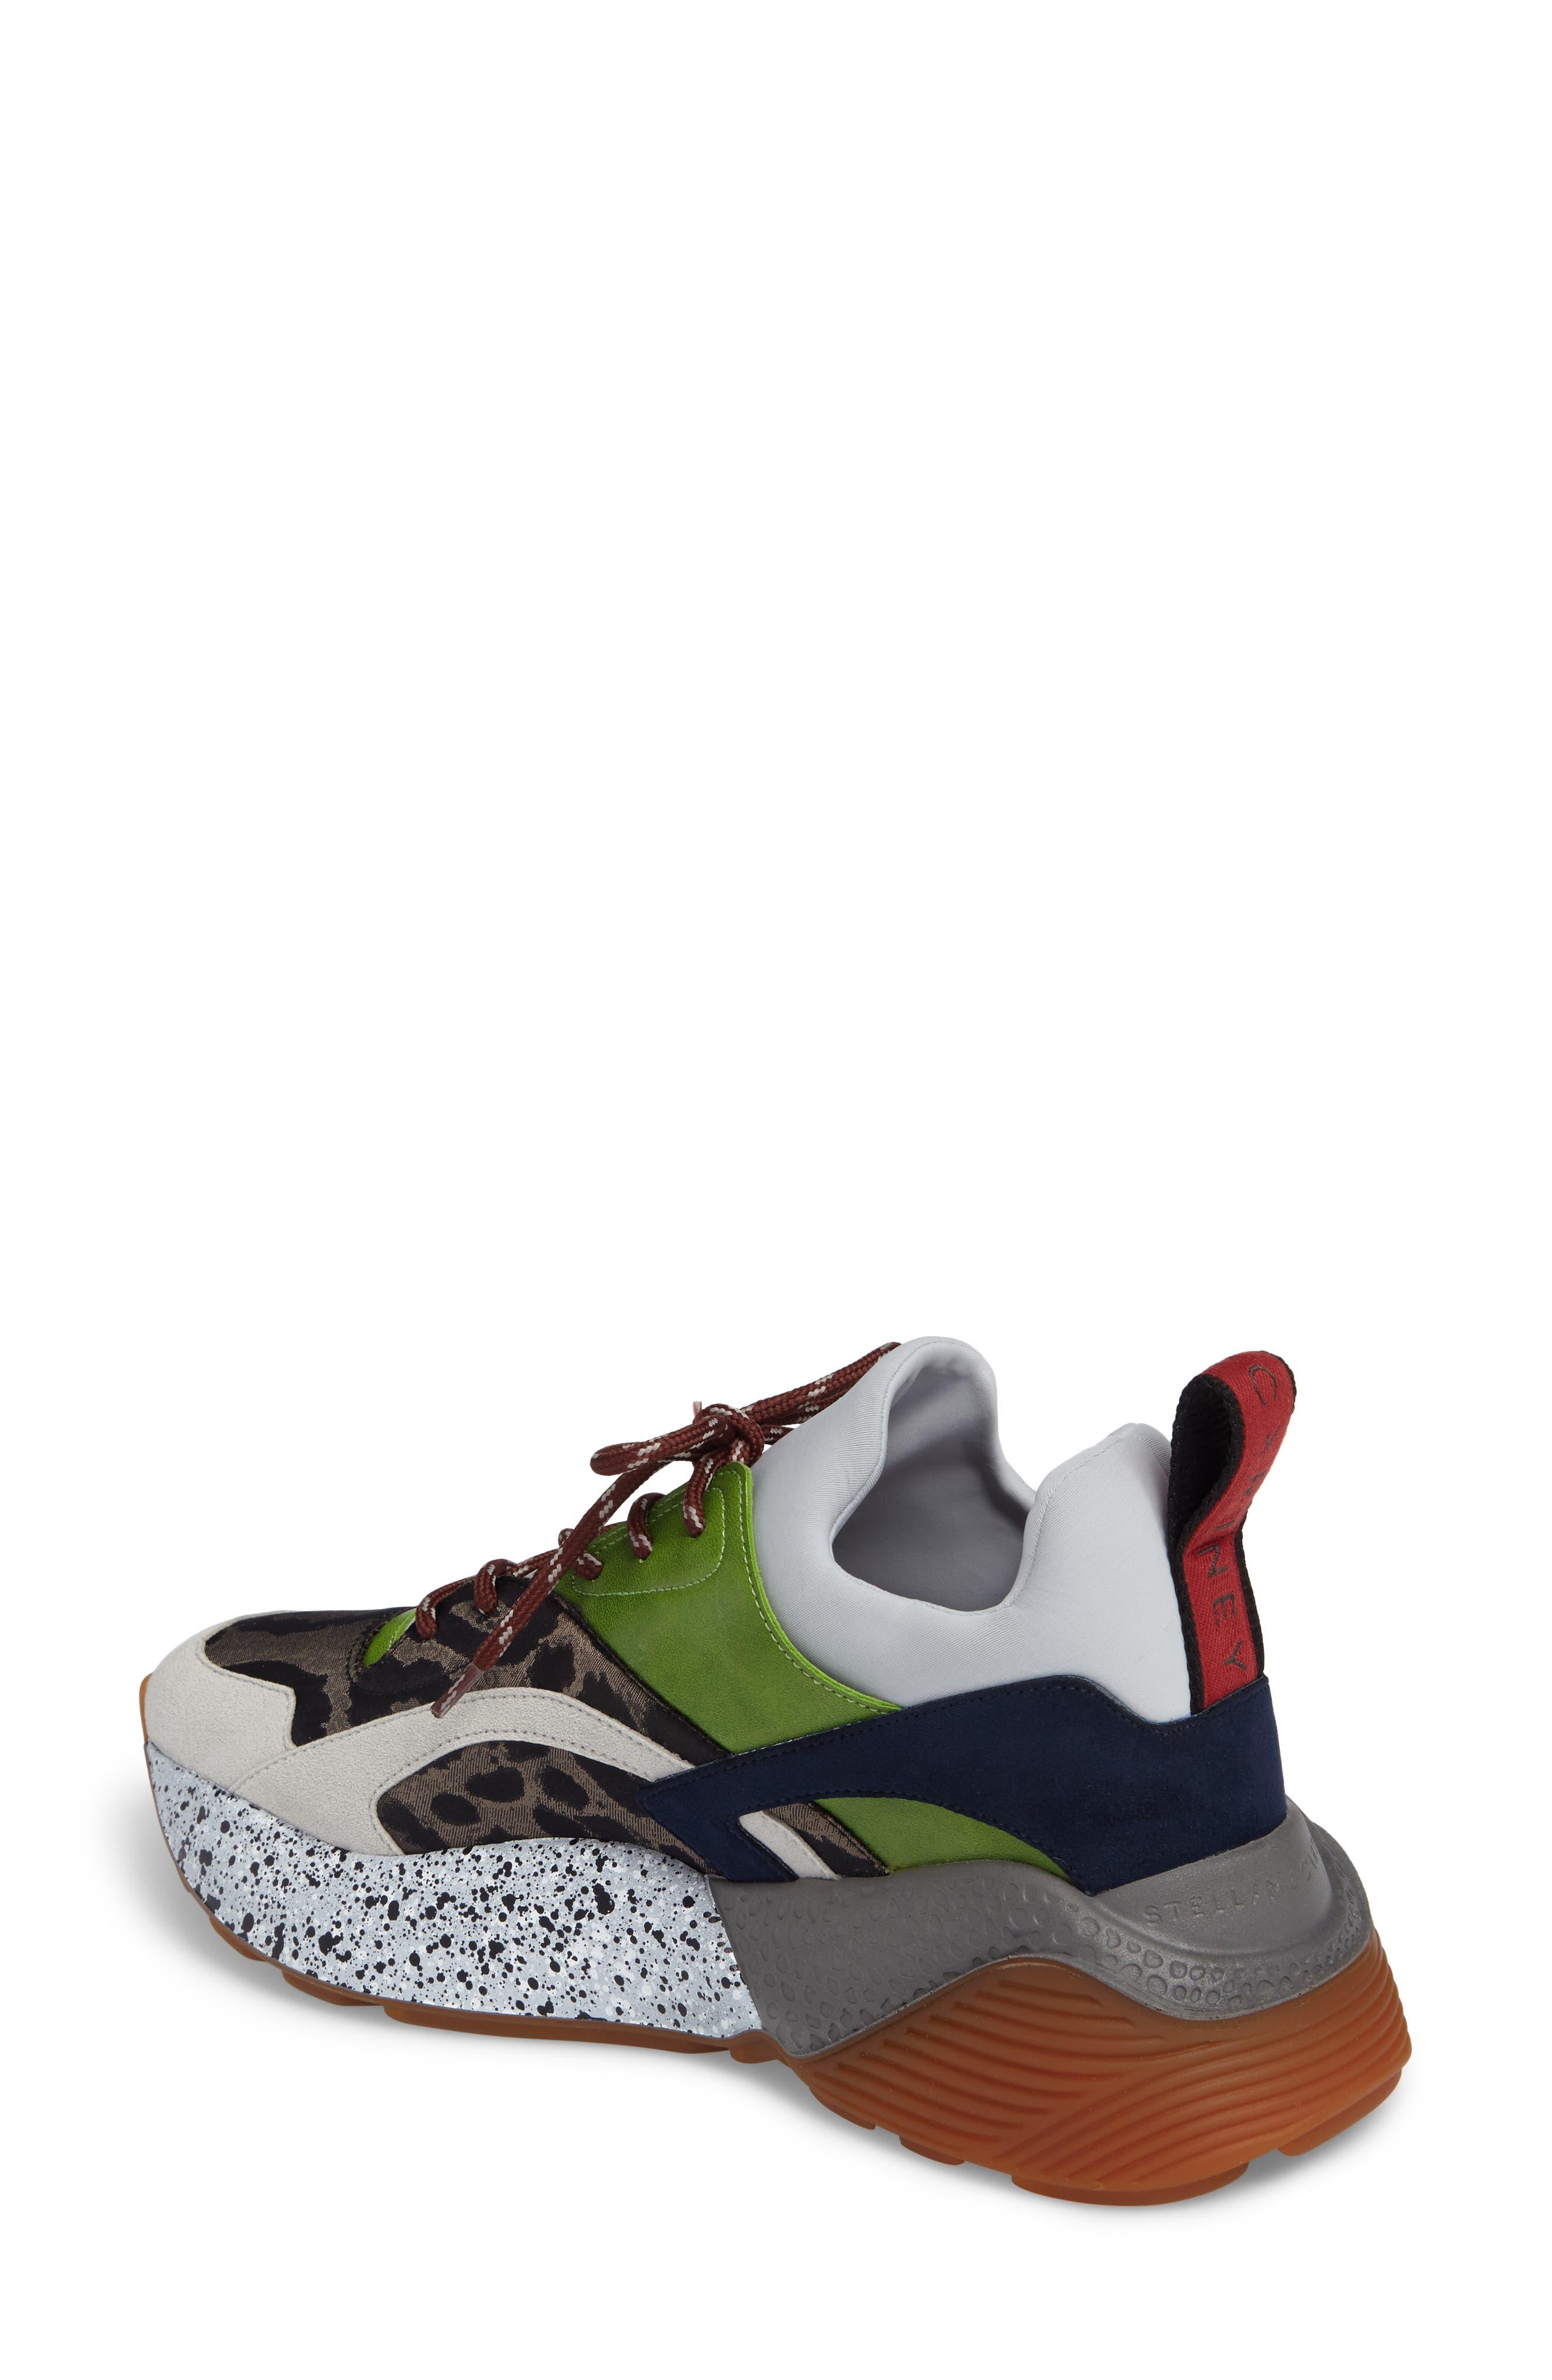 Eclypse Sneaker,                             Alternate thumbnail 2, color,                             Grey Multi